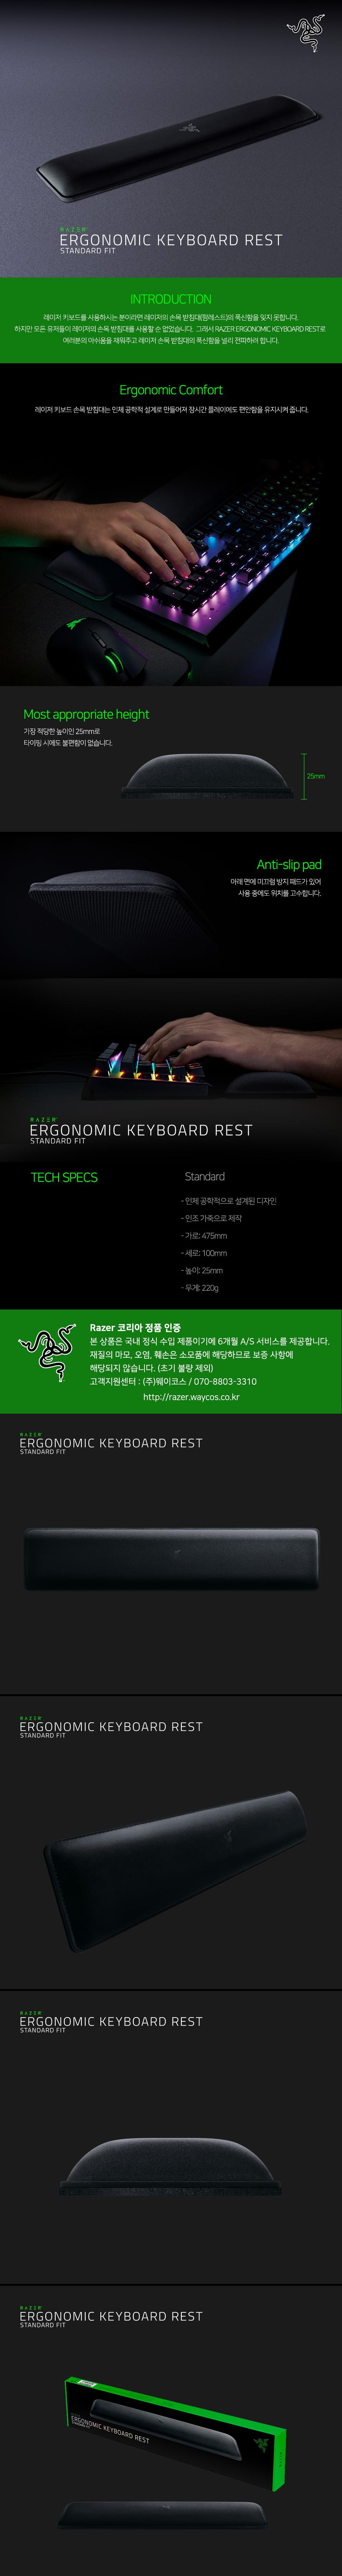 Razer  Ergonomic Keyboard Rest(스탠다드)